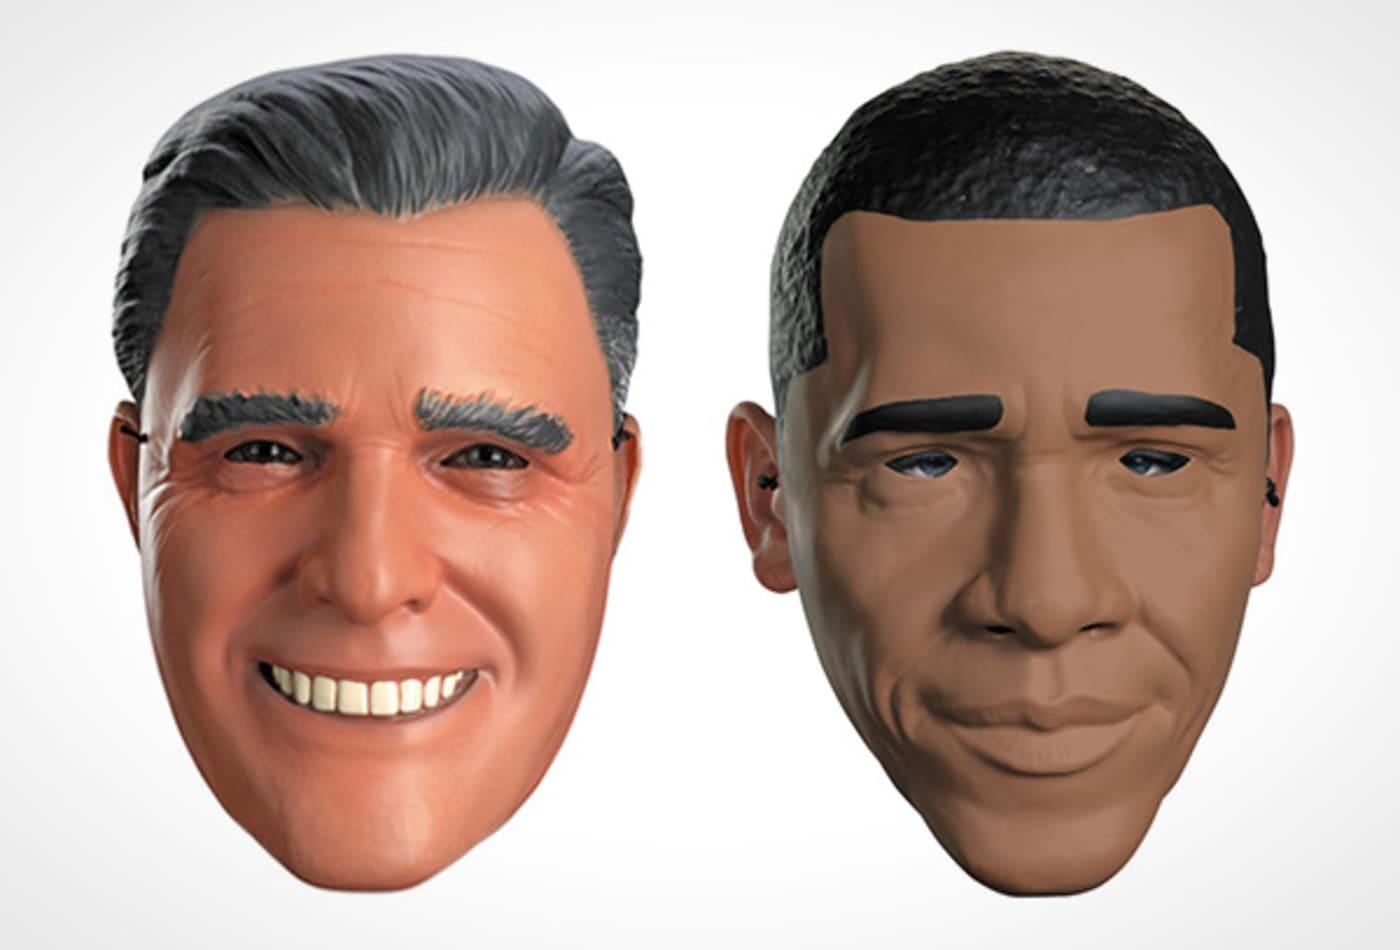 trendy-halloween-adult-2012-ObamaRomney.jpg